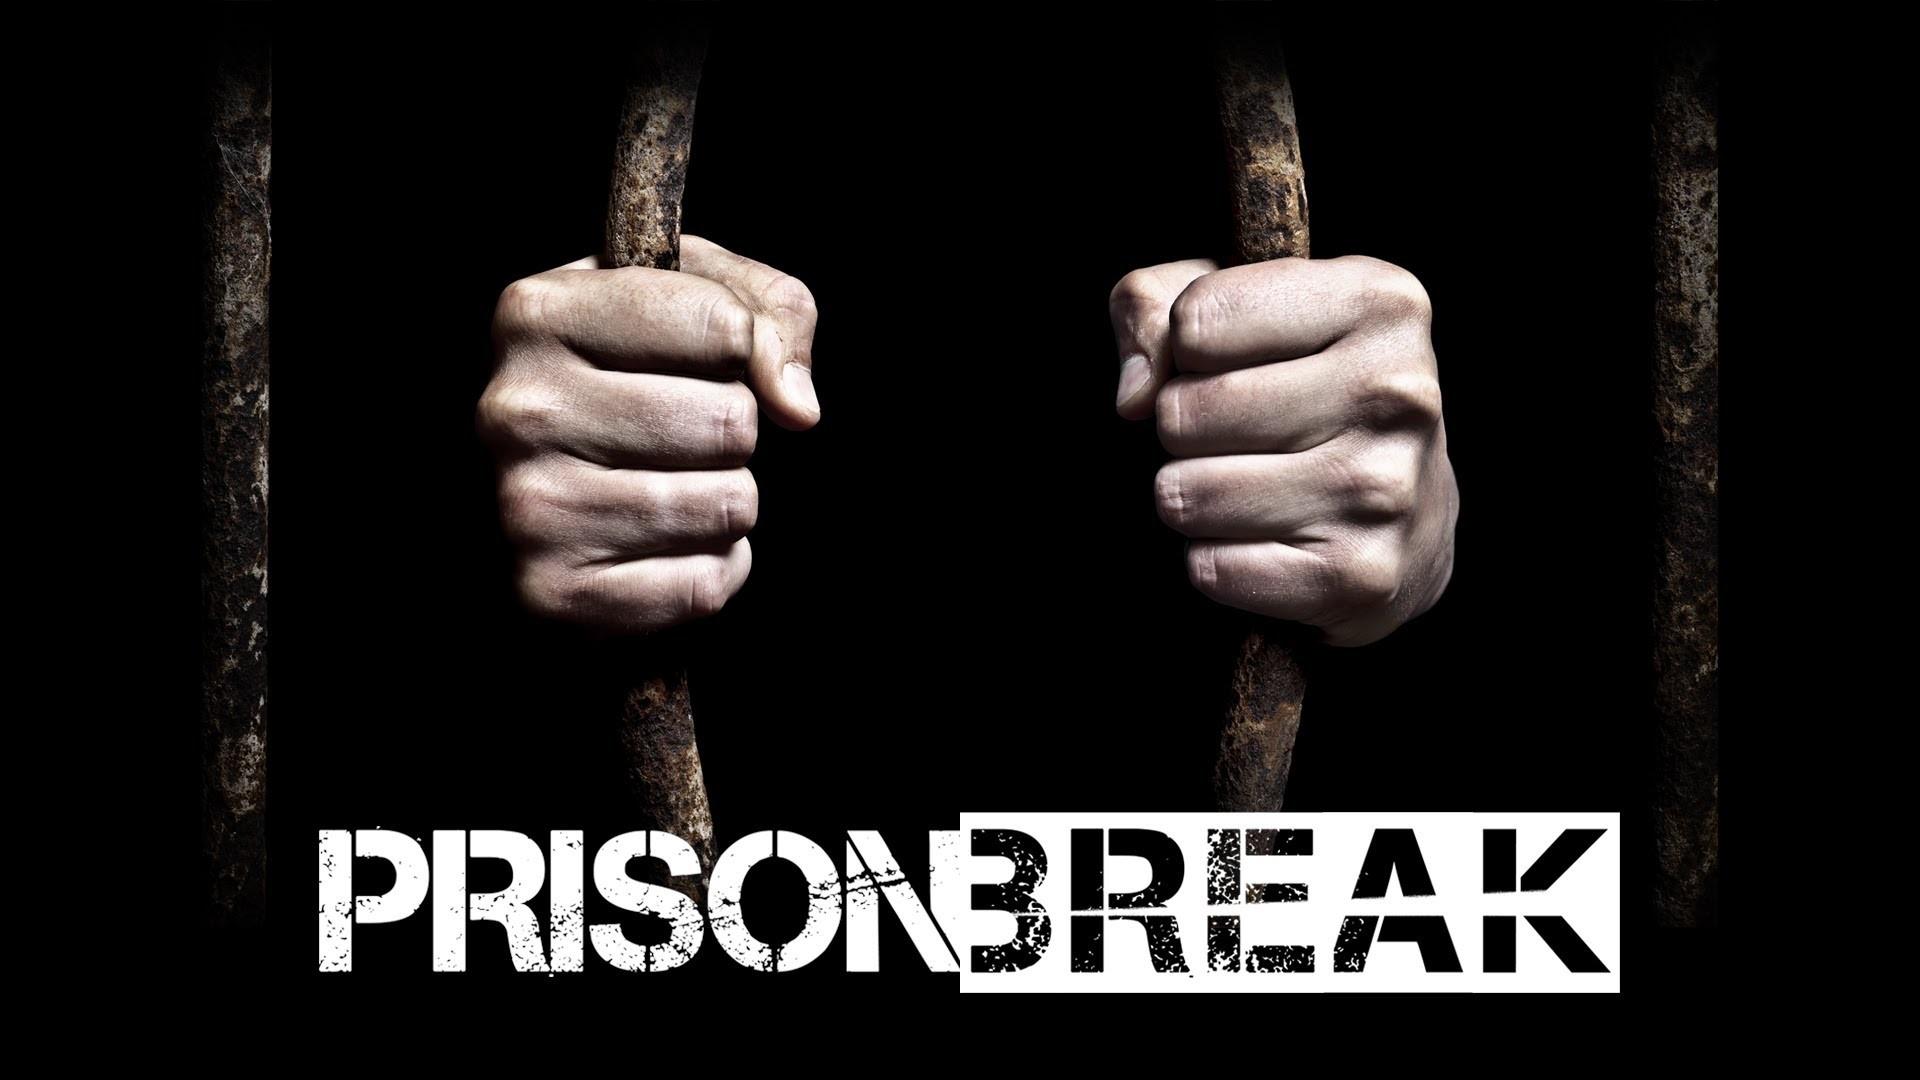 Top 20 Prison Break Wallpapers